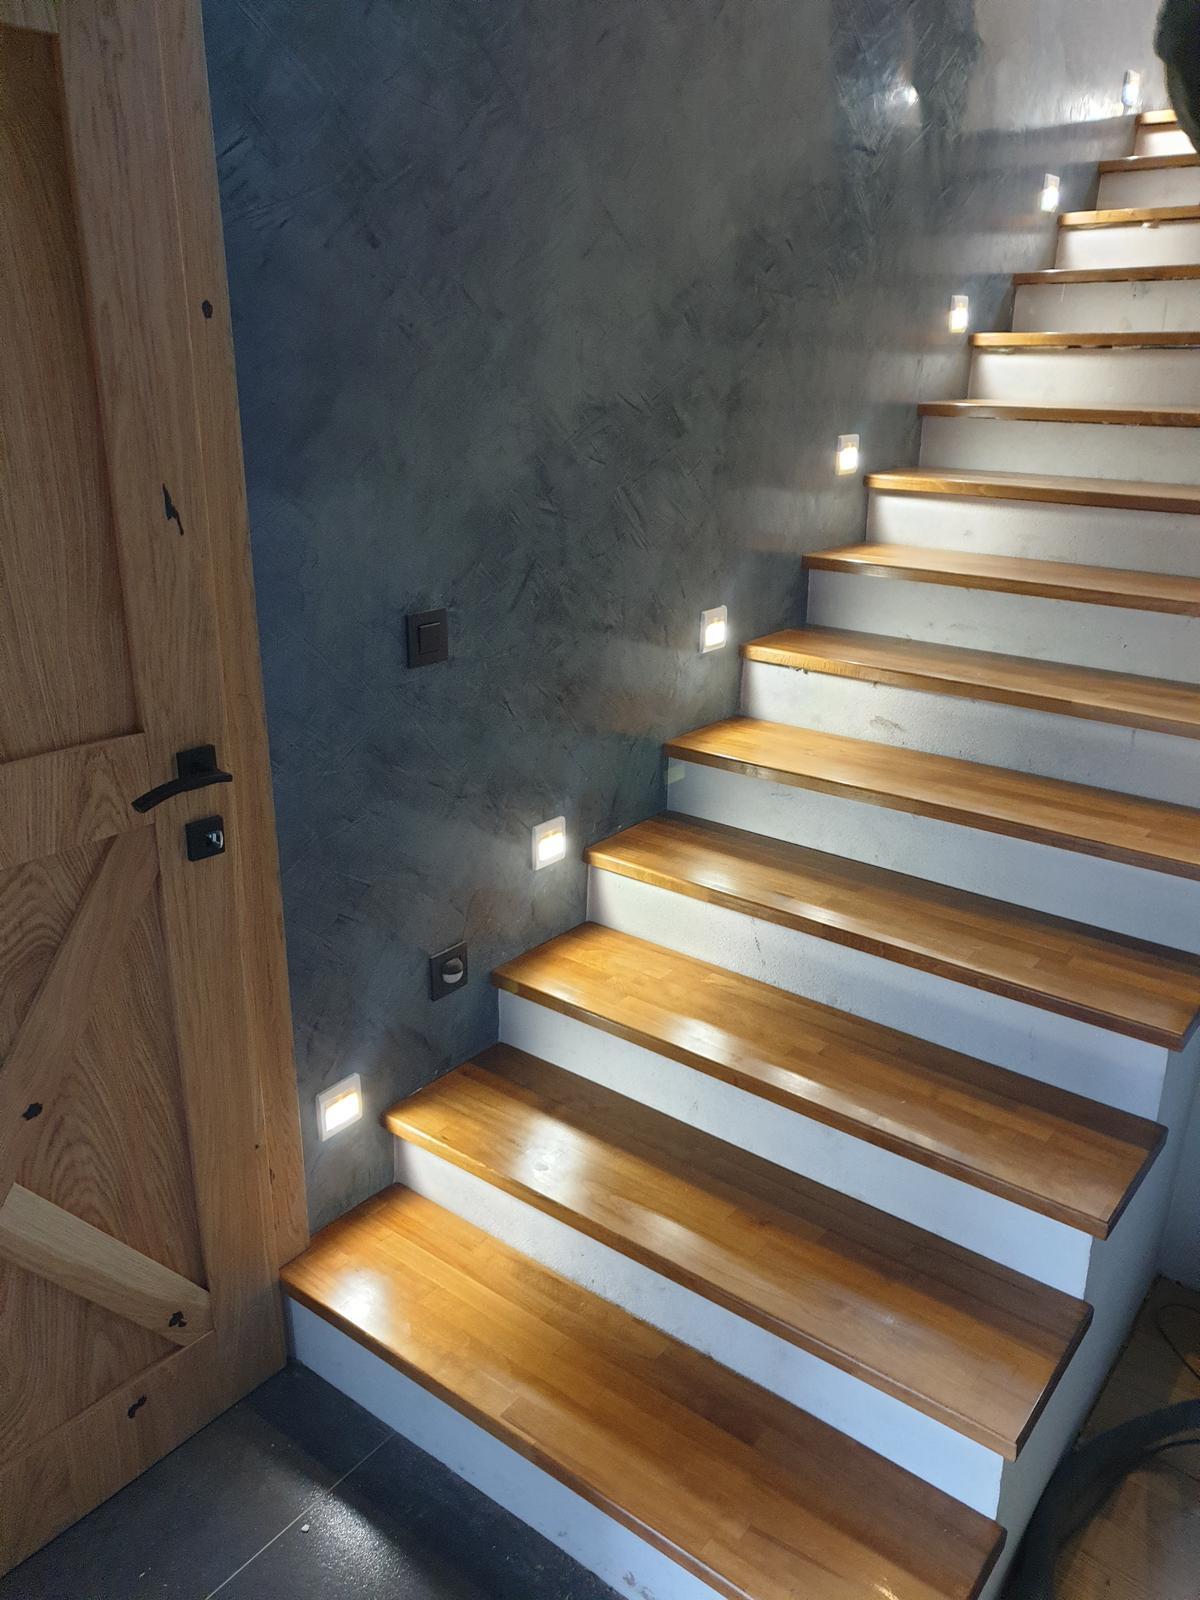 Konzolové schody - BUK, DUB - Obrázok č. 51